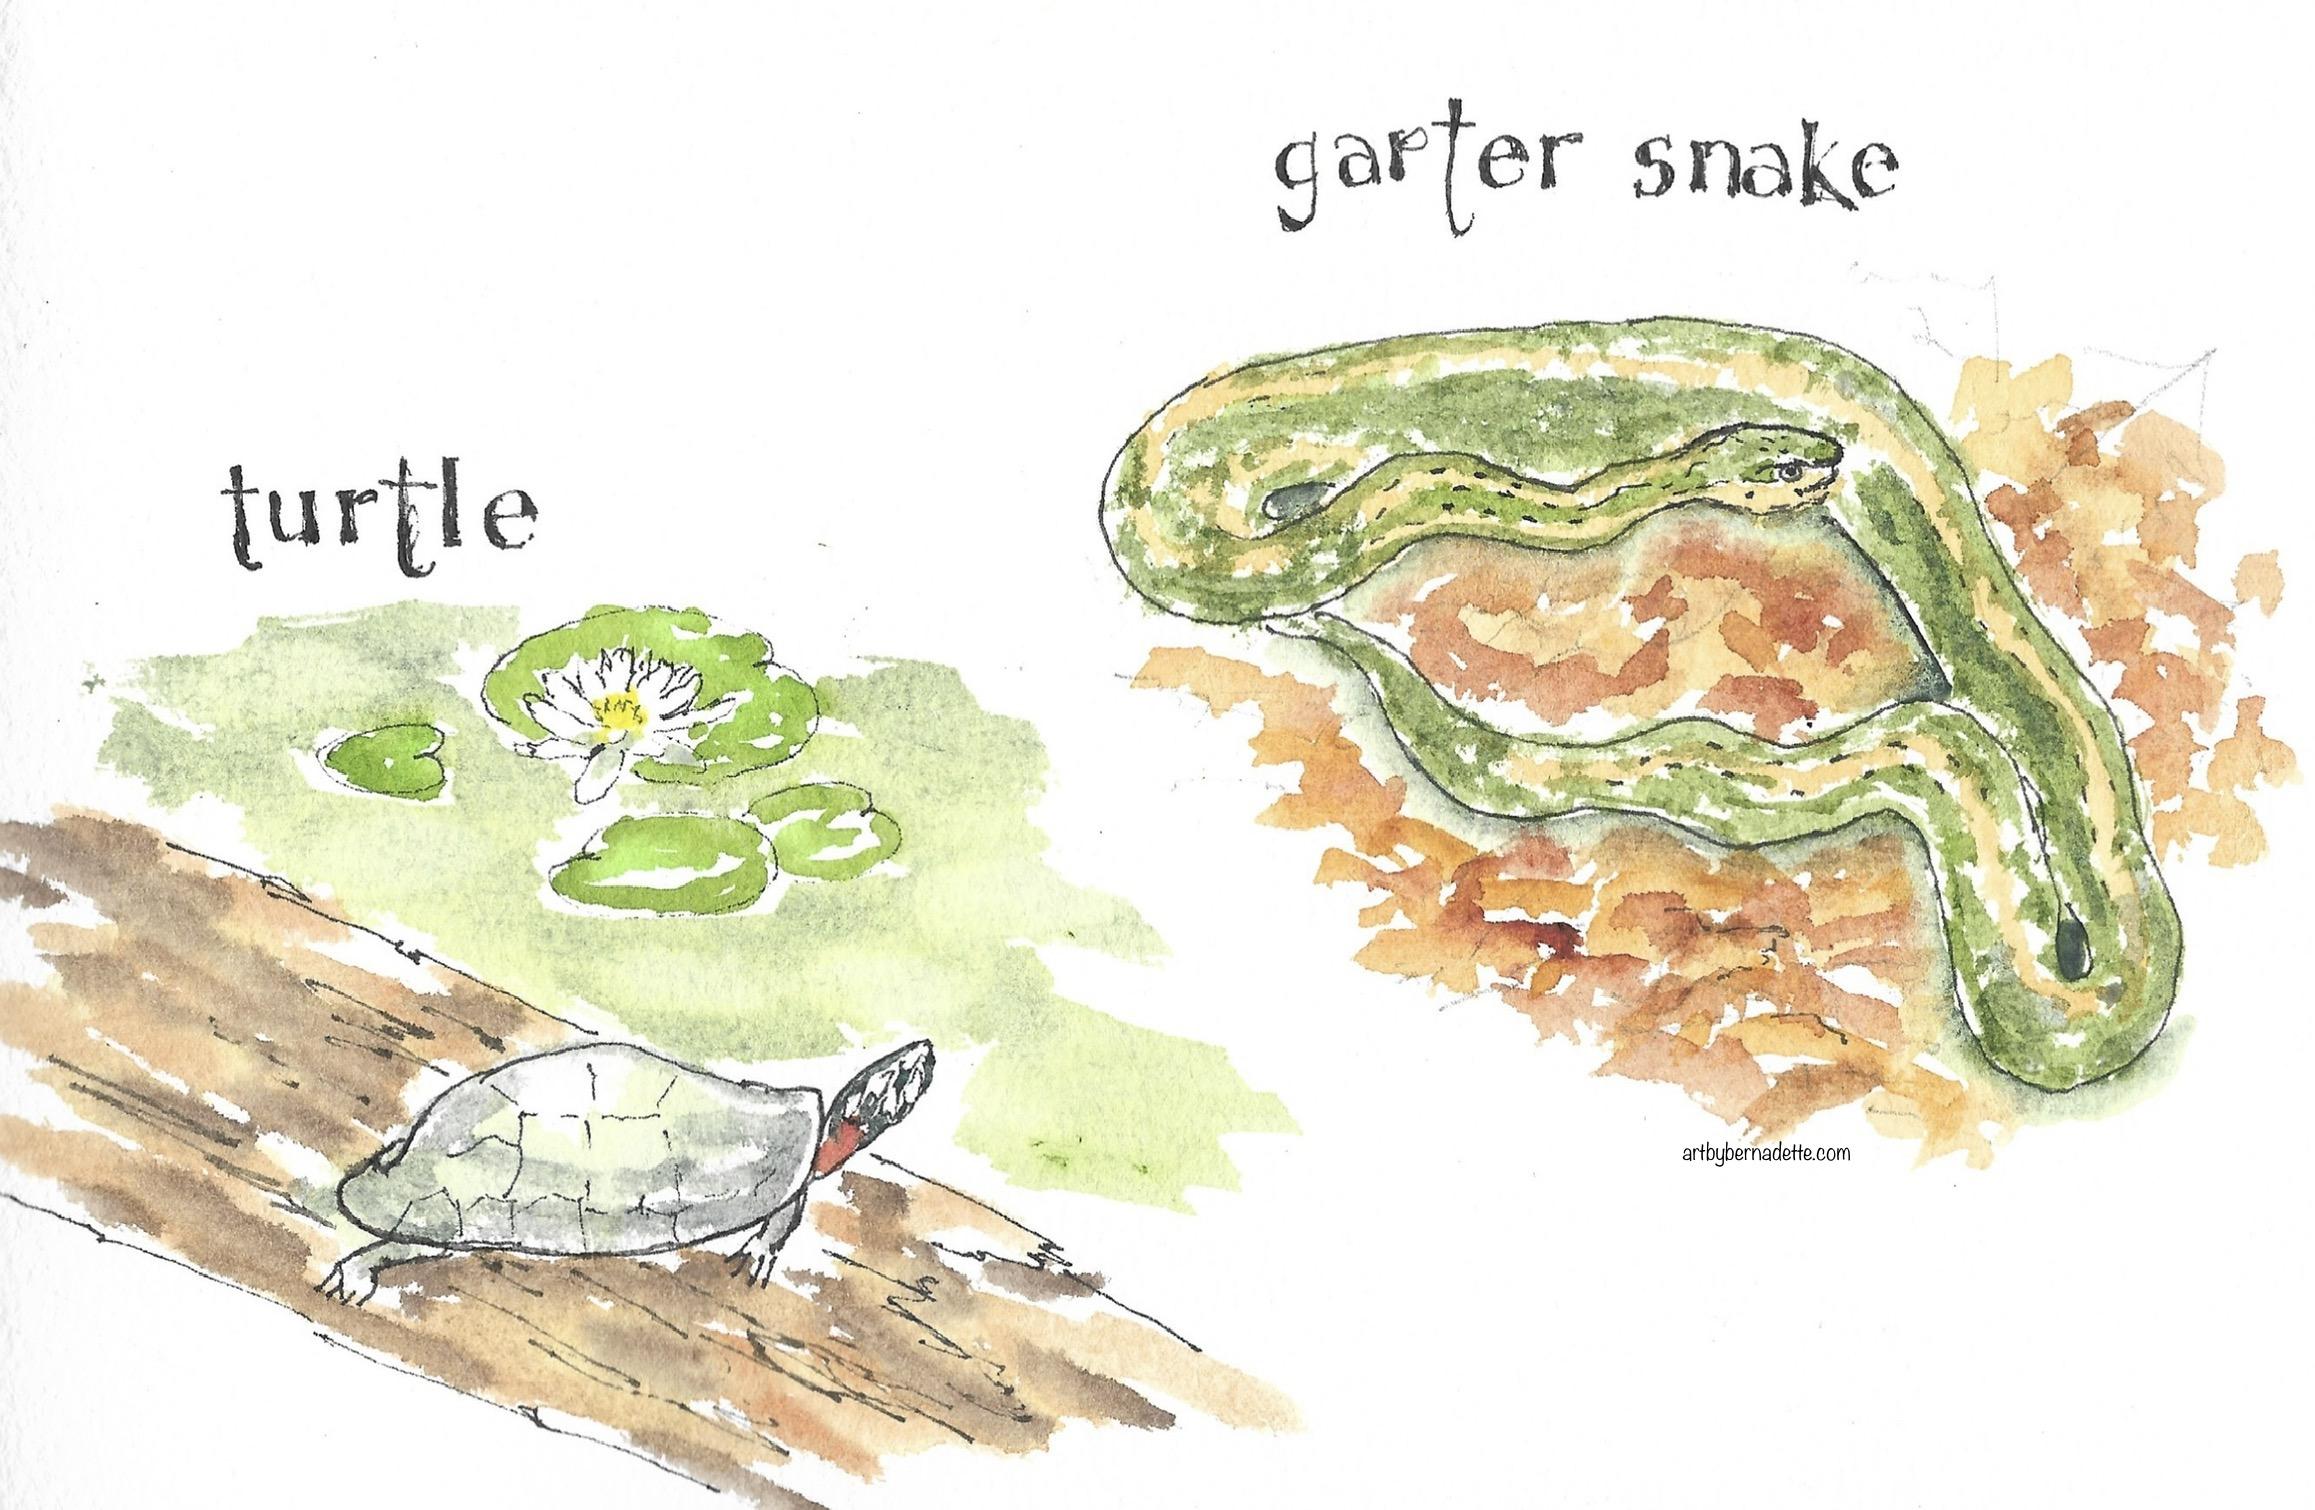 Turtle and garter snake